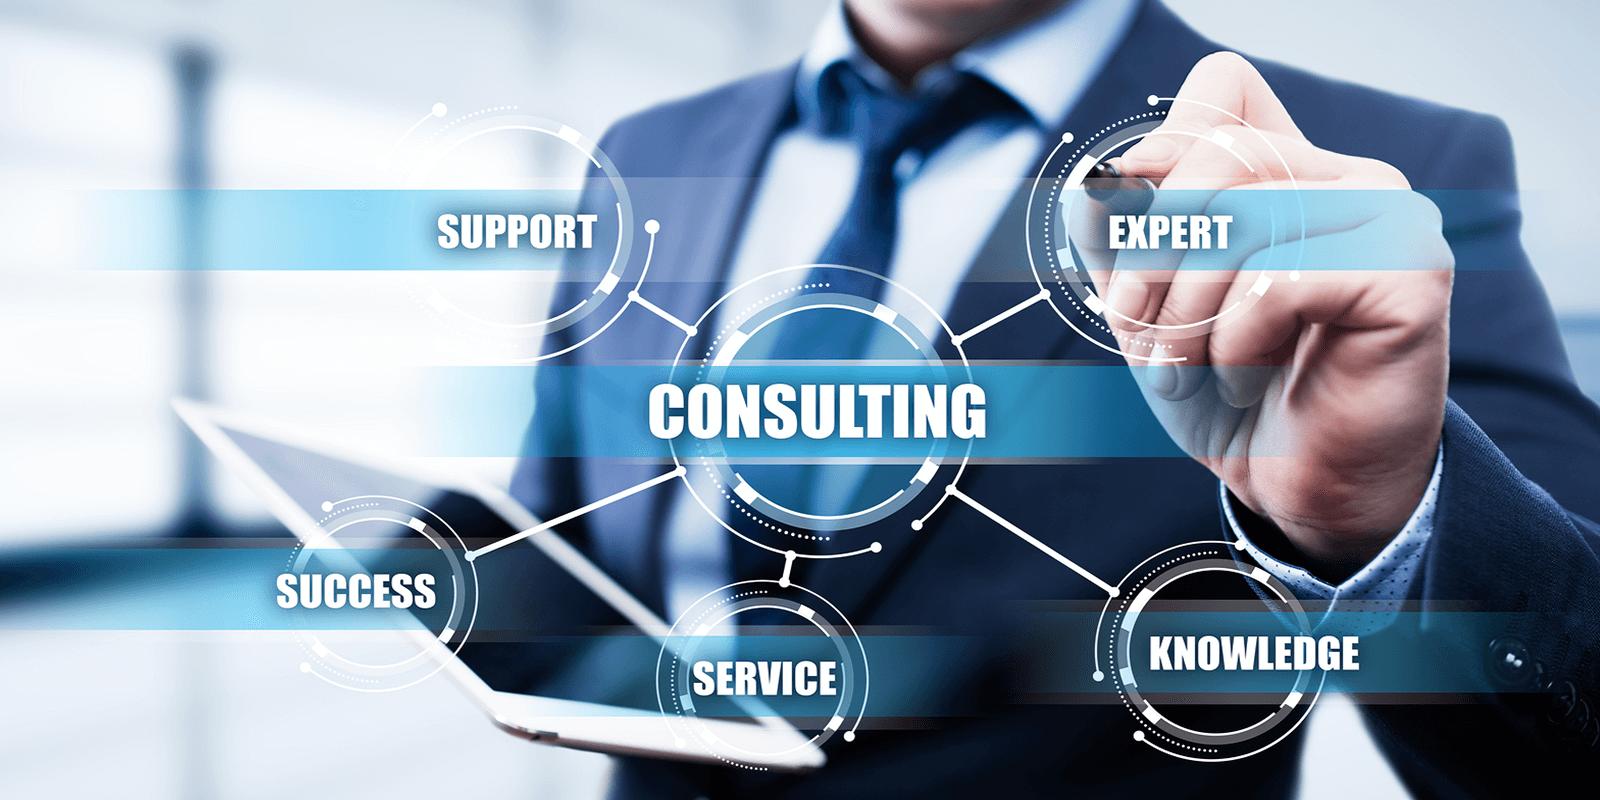 Michael Stevens Consulting Recruitment2021/2022 Application Form Portal